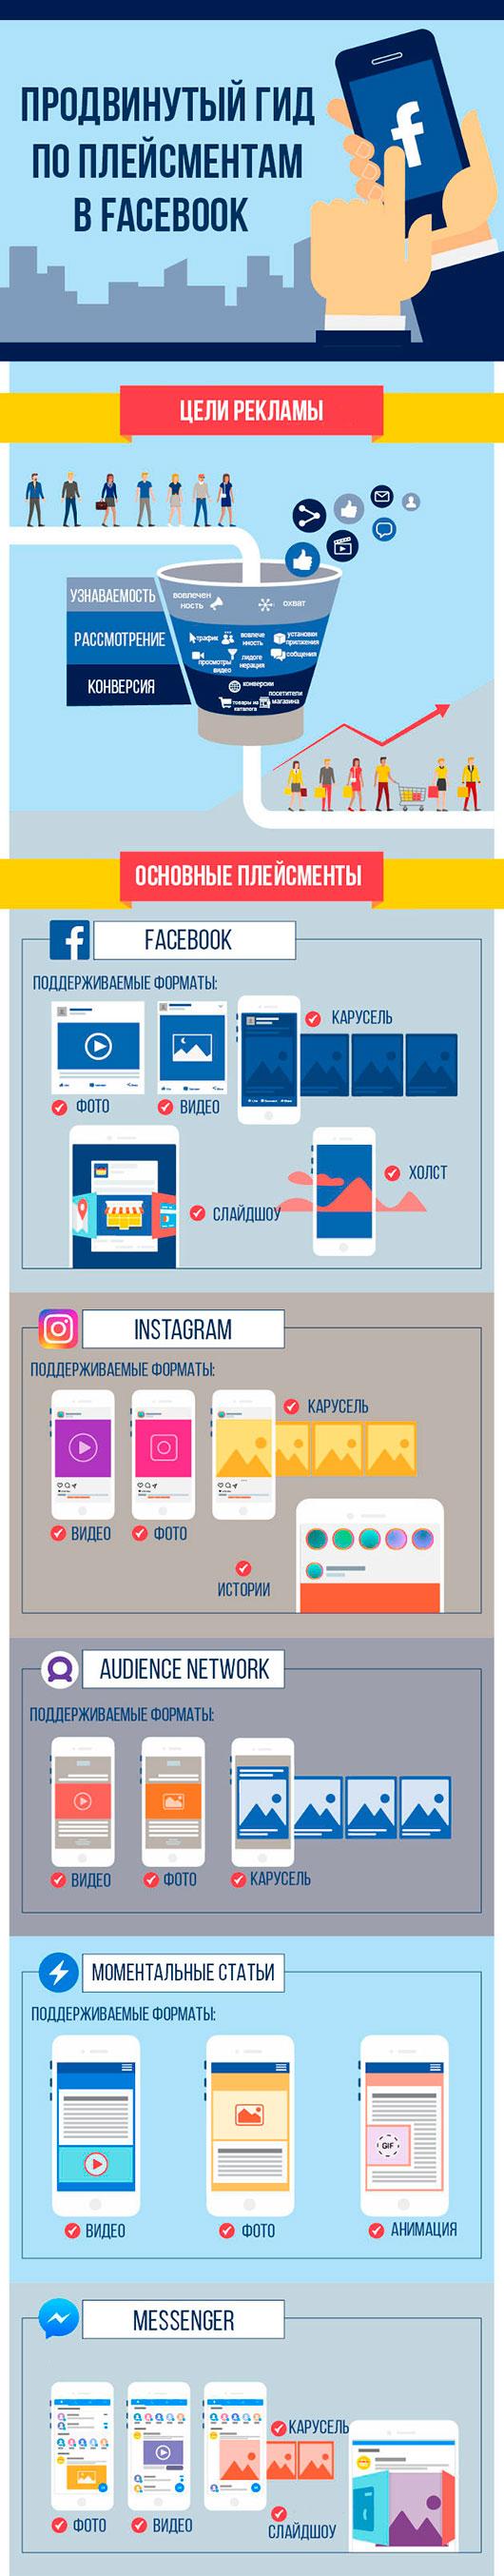 facebook-infografika11-jpg.159